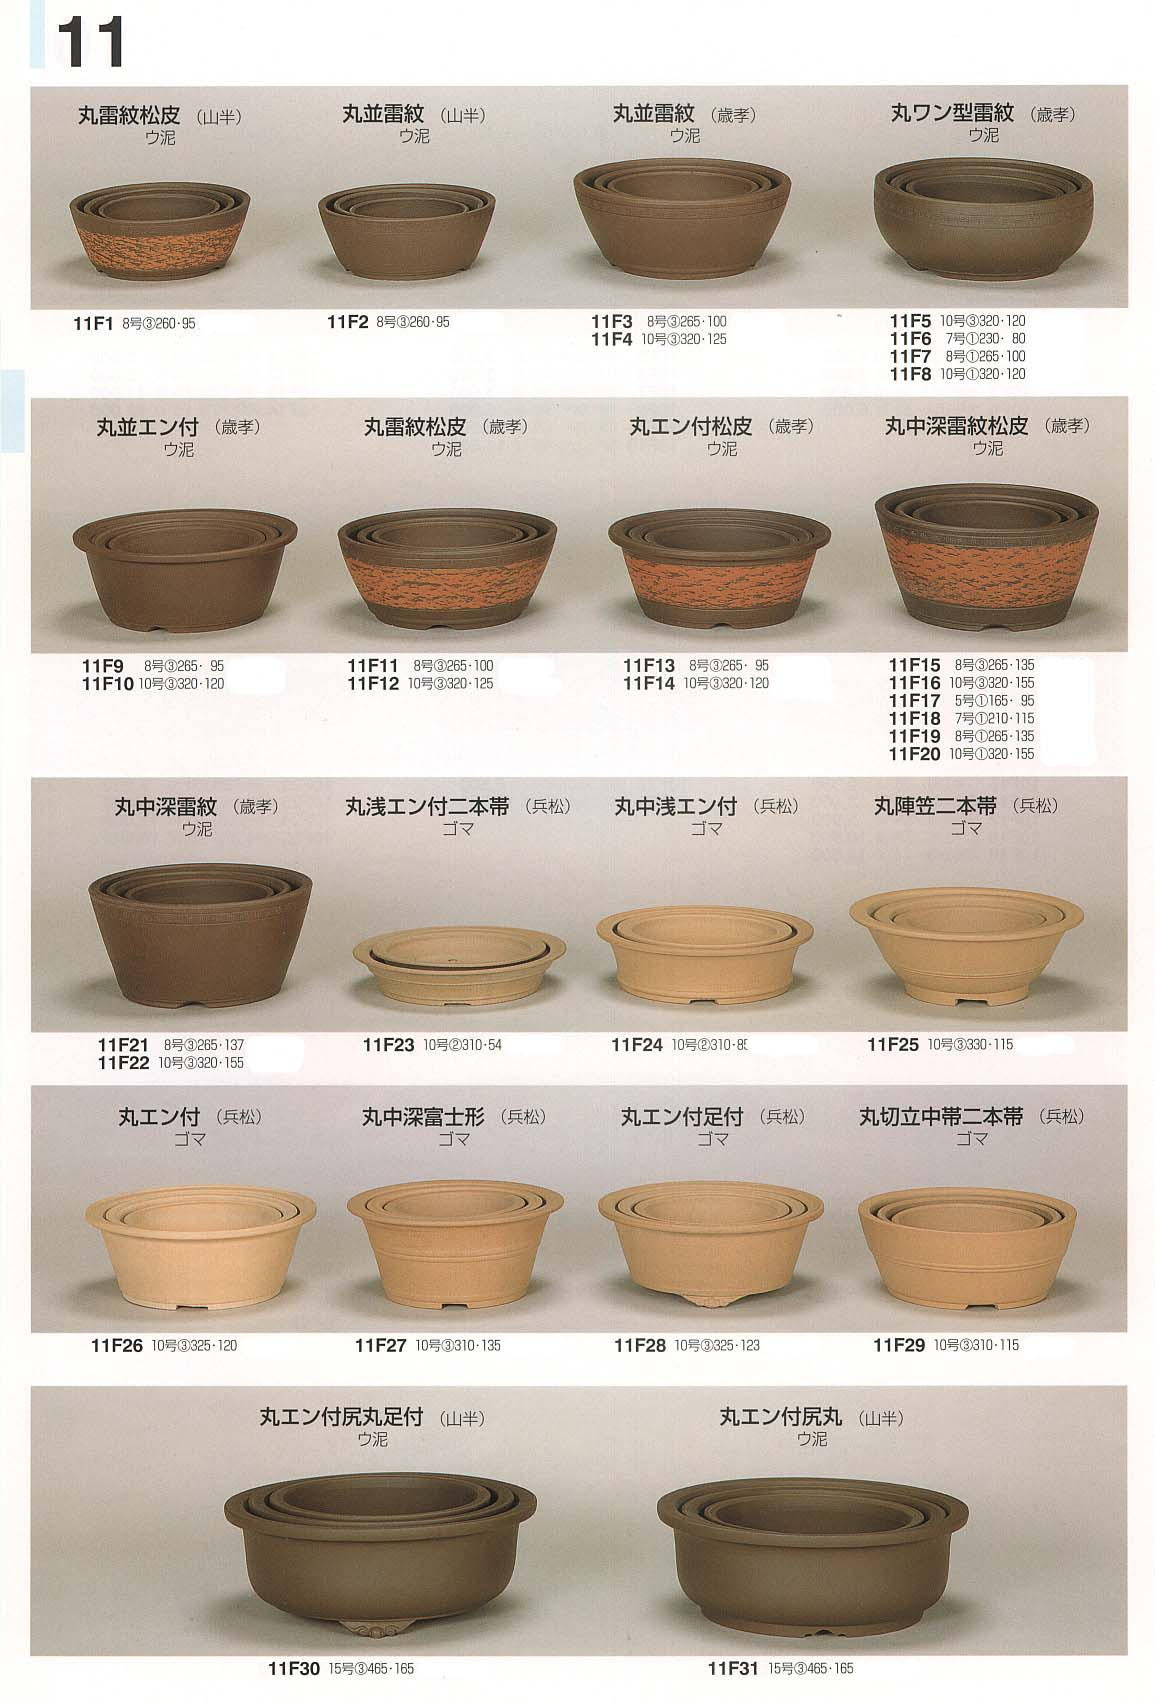 Vasi giapponesi for Vasi bonsai giapponesi